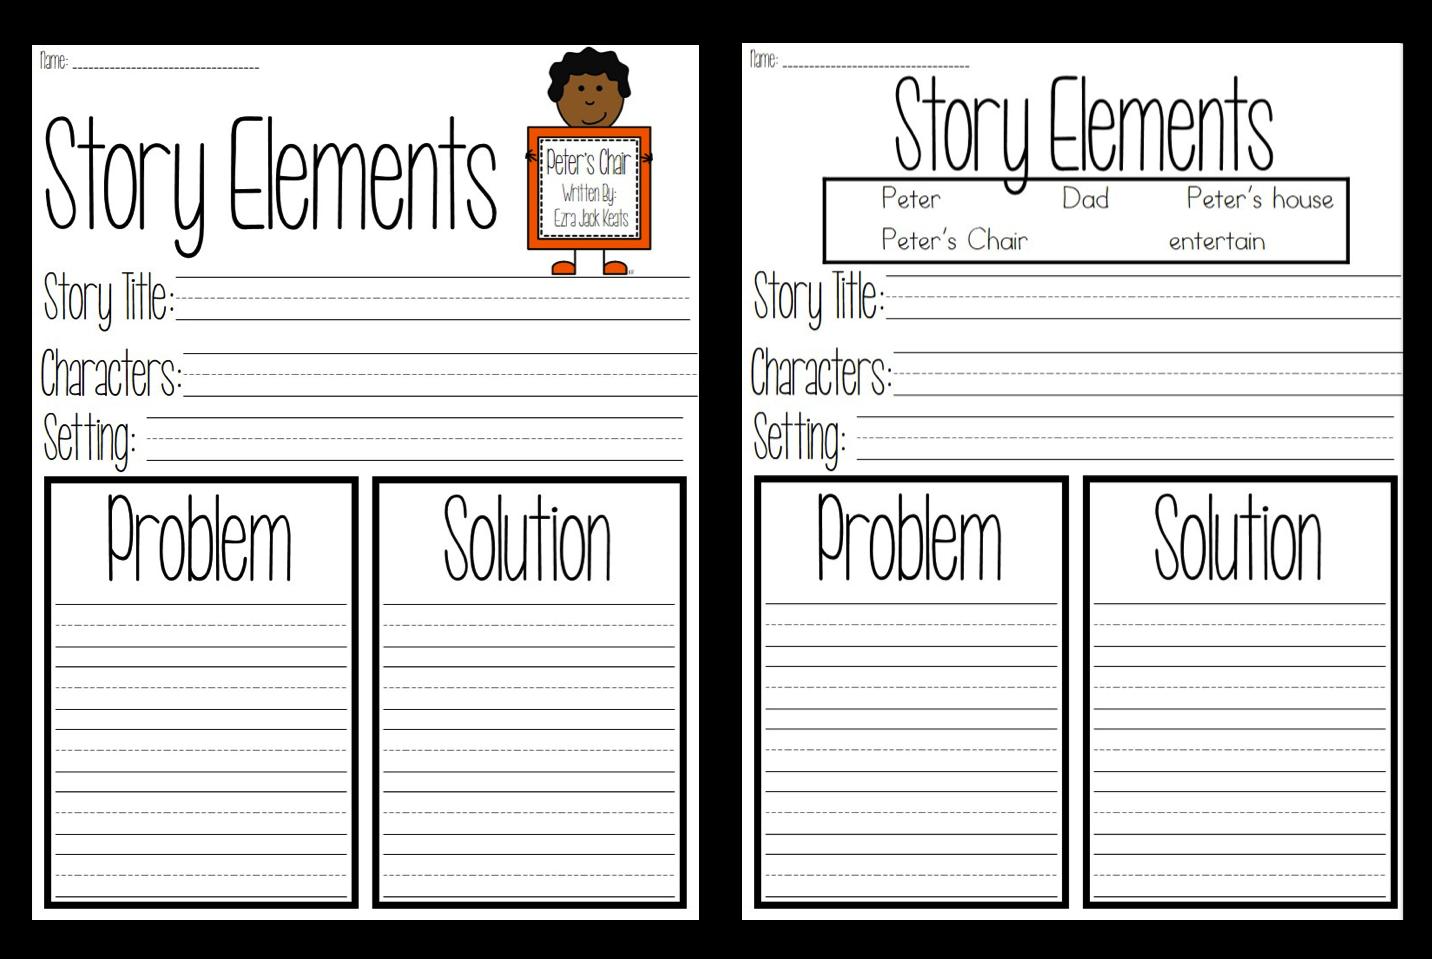 Worksheets Story Elements Worksheet story elements worksheets pictures to pin on pinterest clanek element worksheet davezan 1432x959